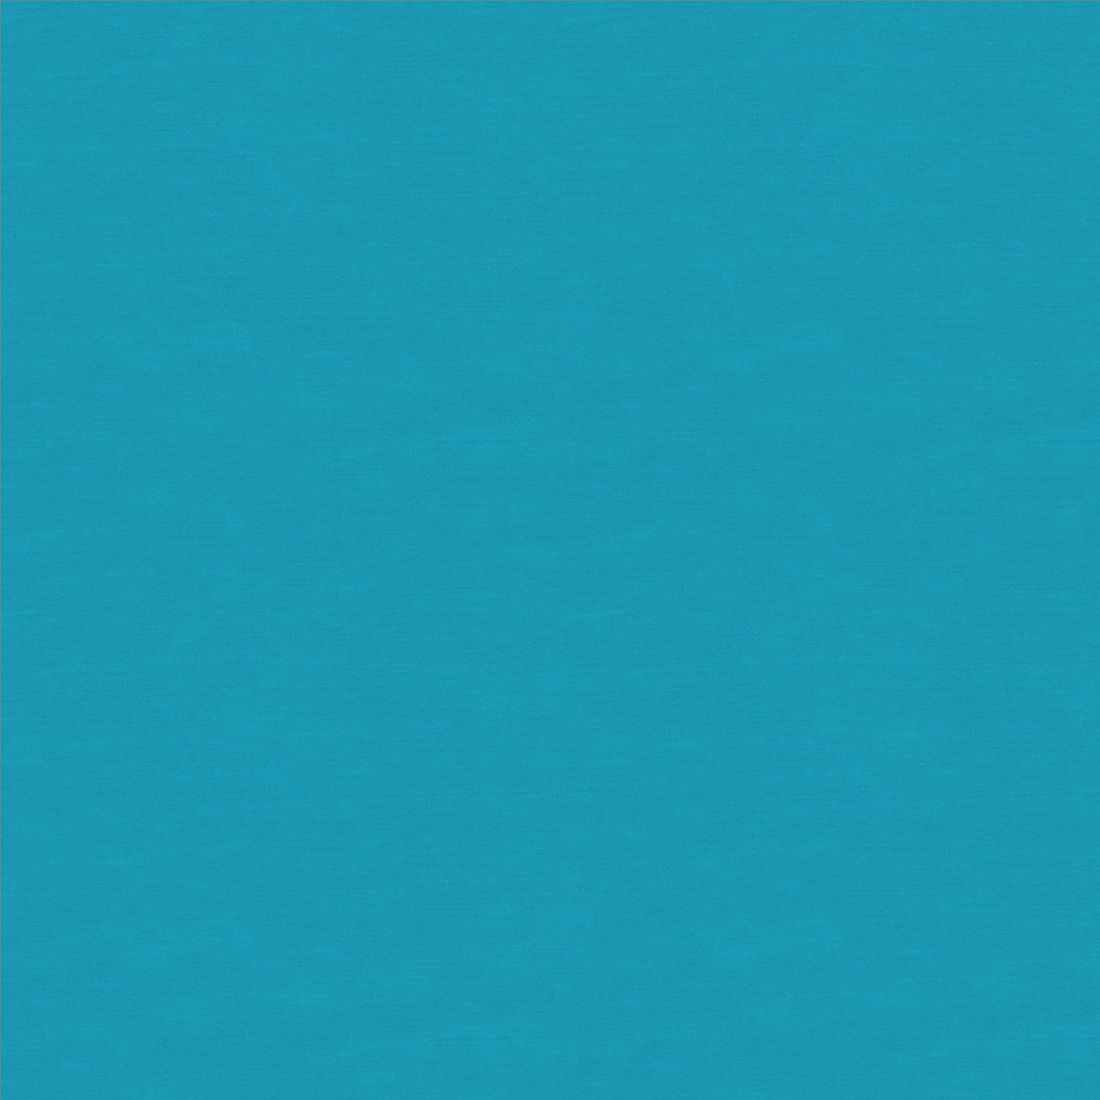 Serviette Combo (4er-Set) – Karibik, Villeroy&Boch online kaufen